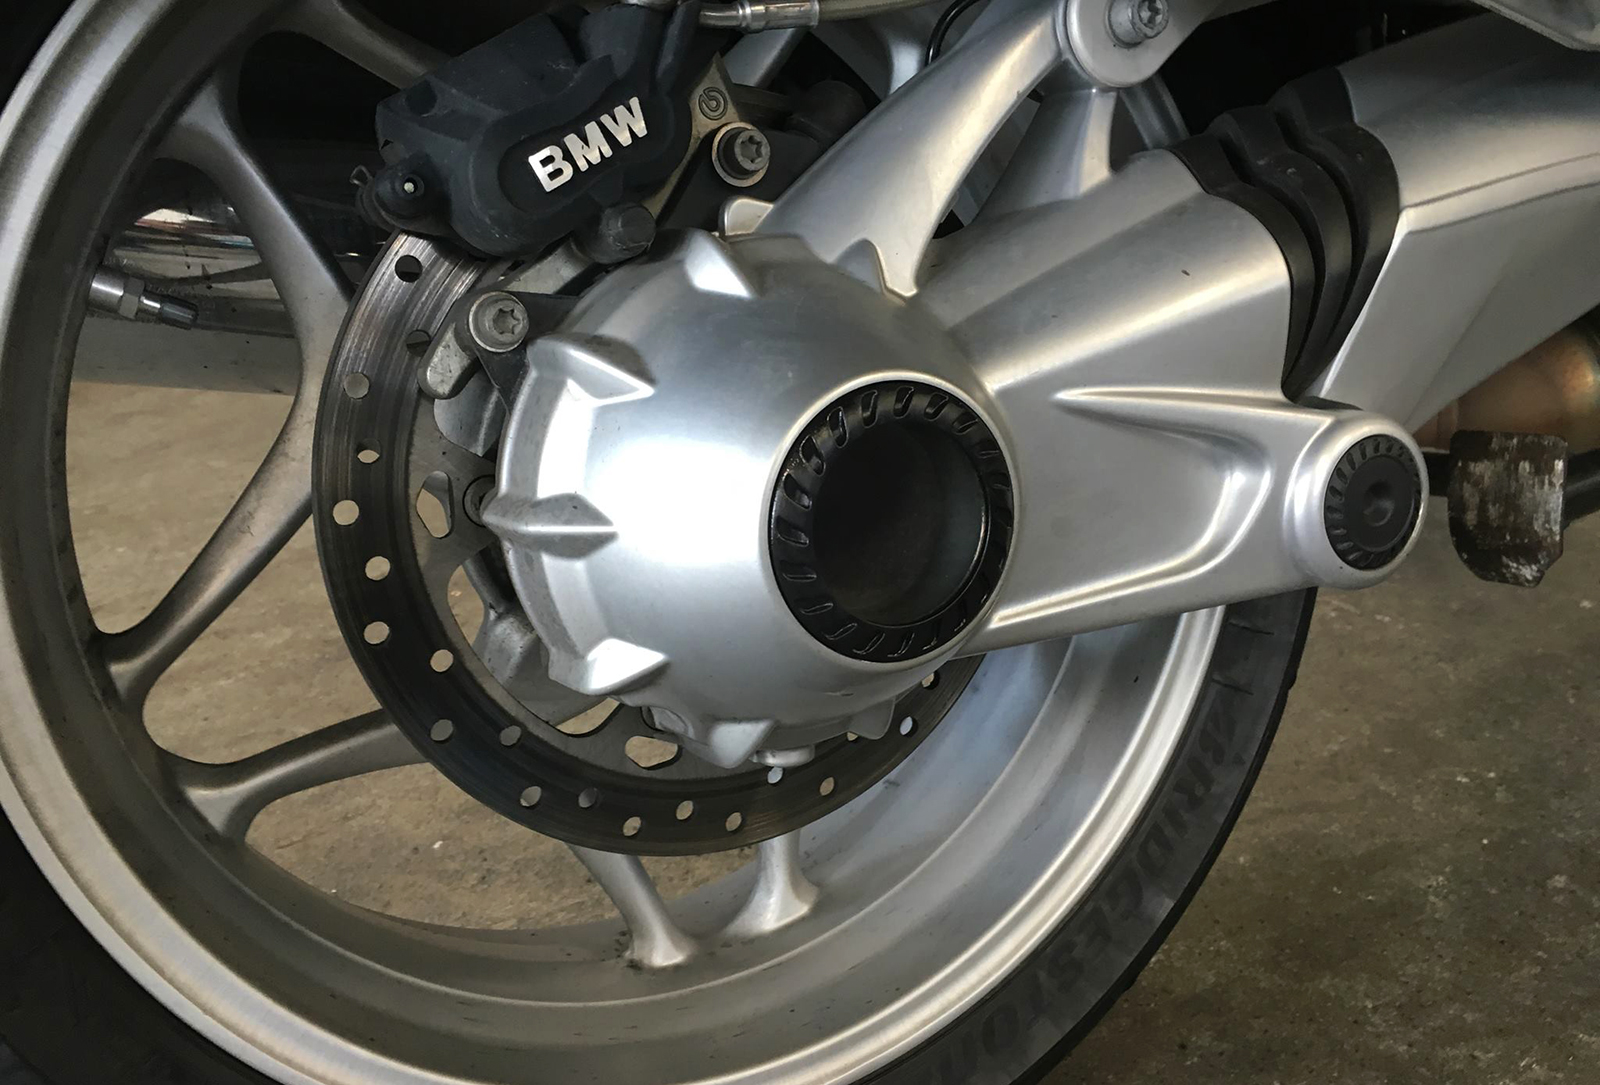 BMW RT O-Ring problem